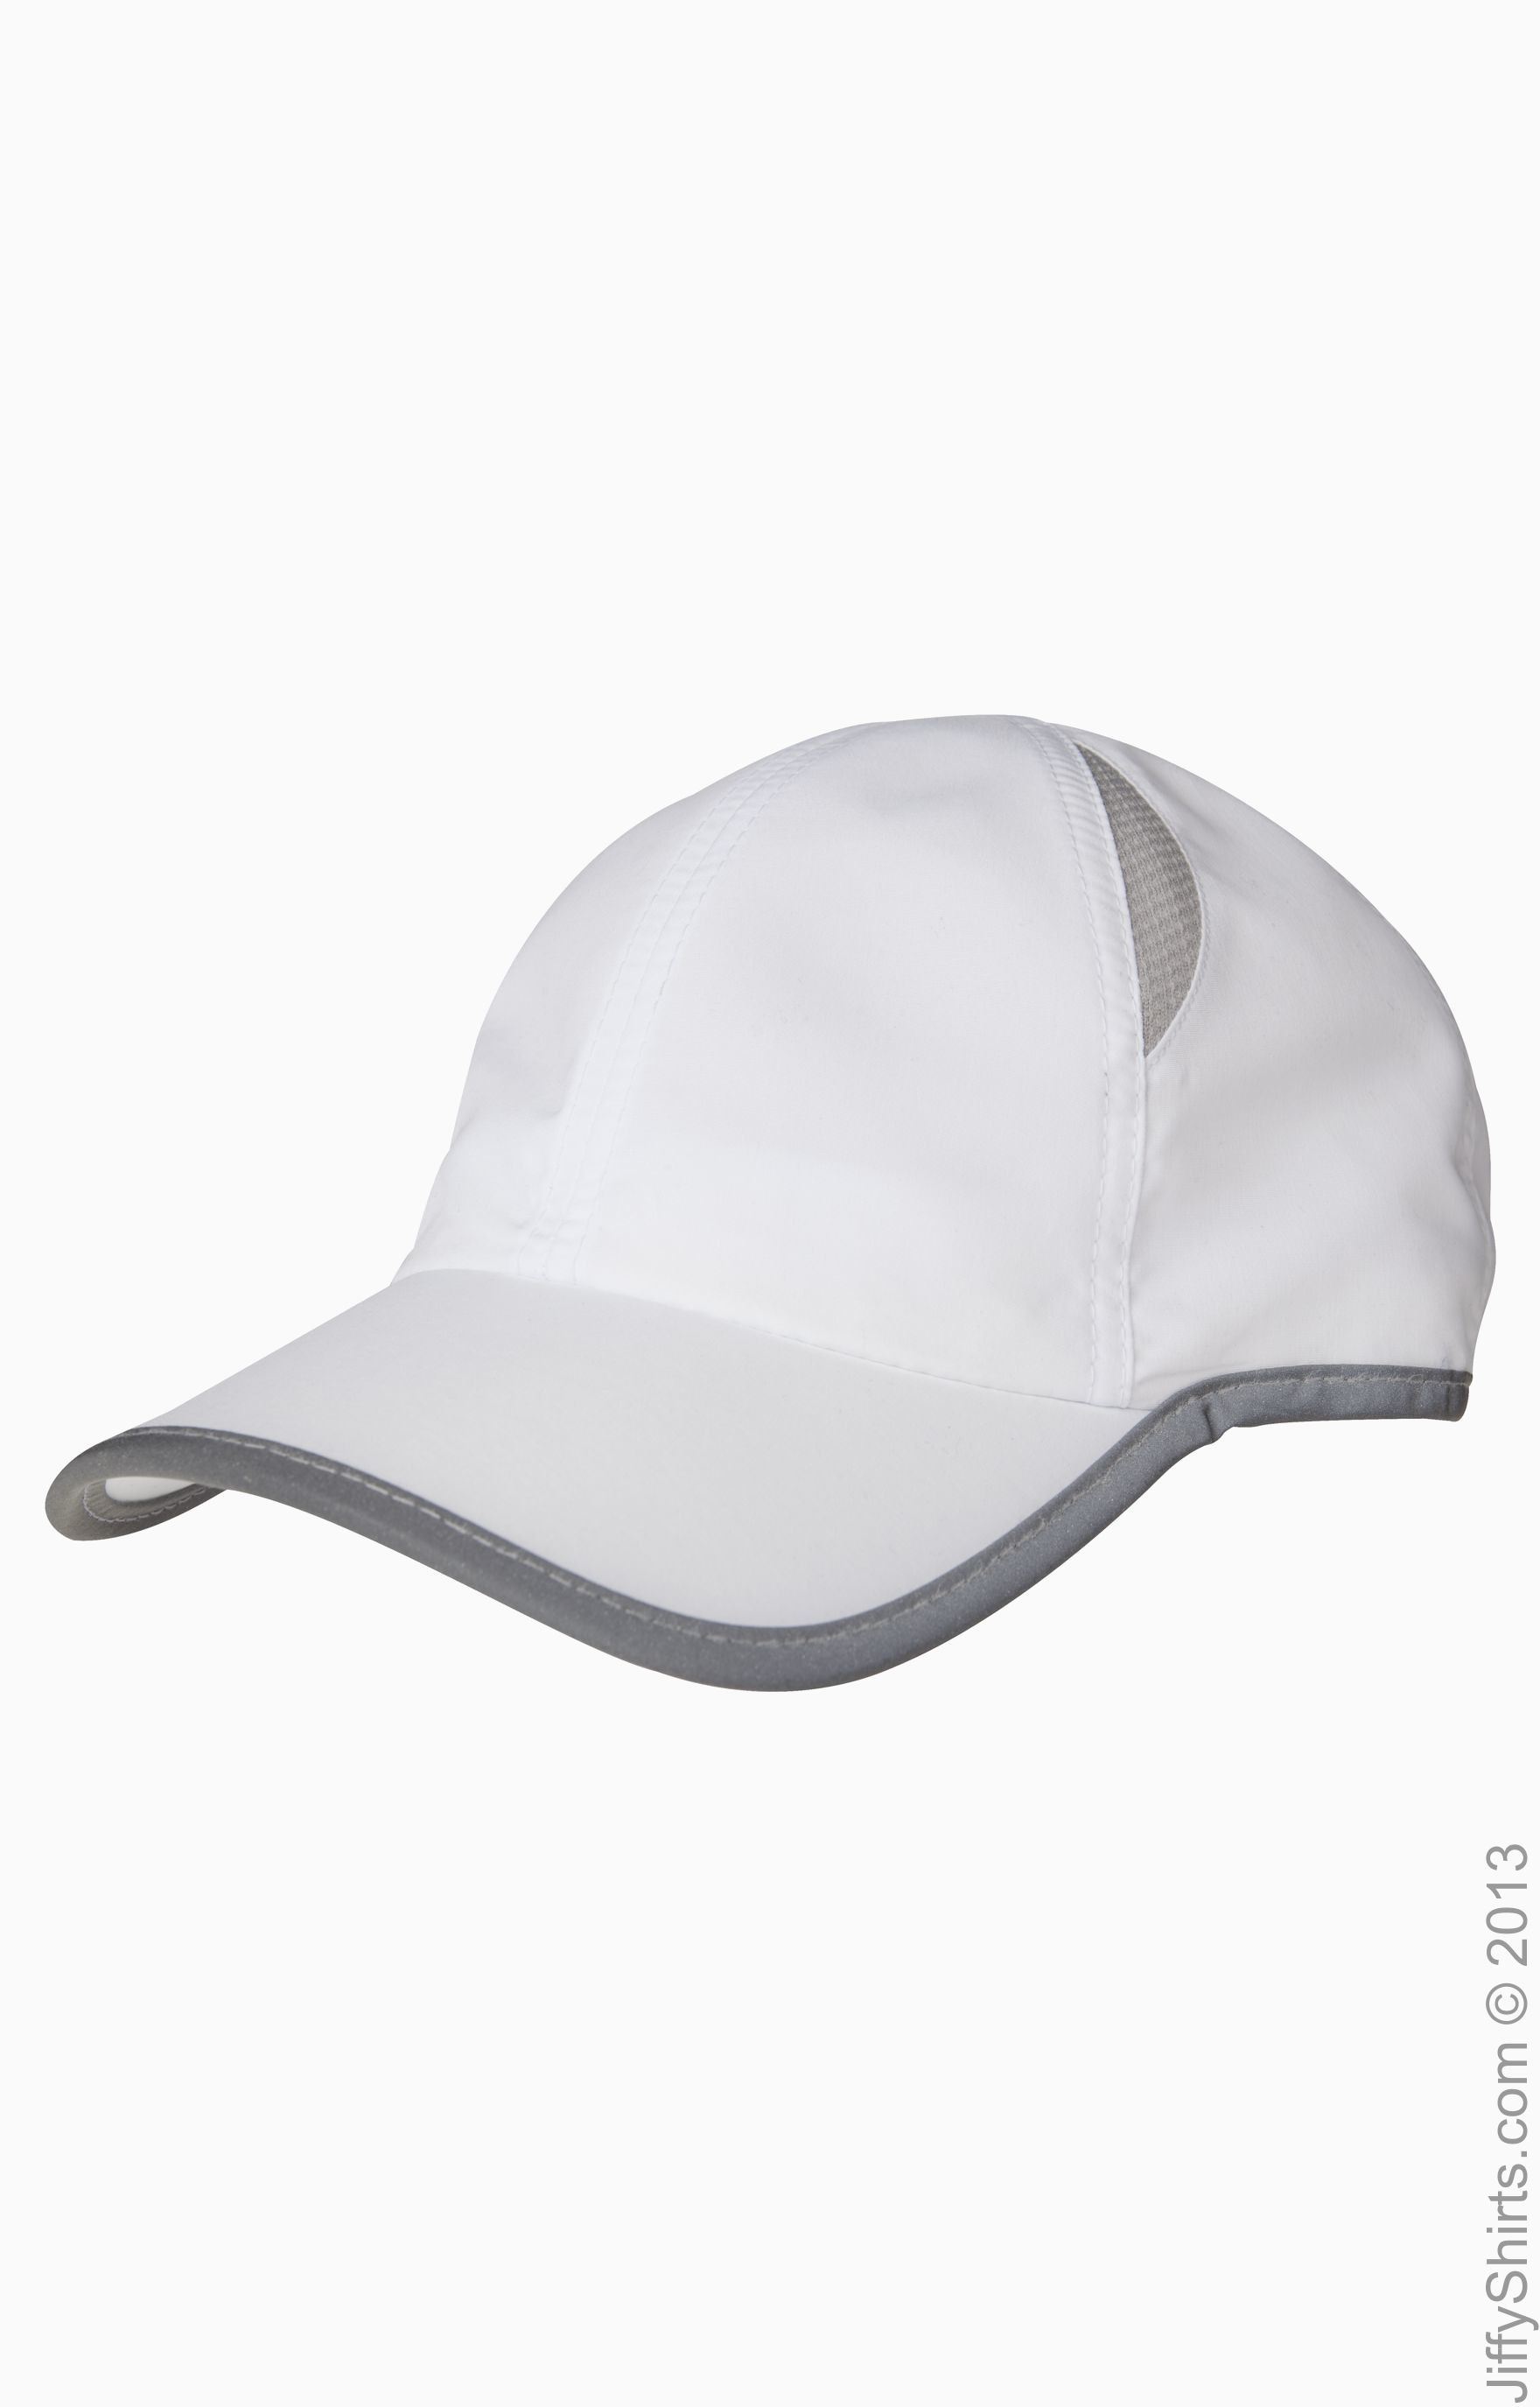 BA514 - White